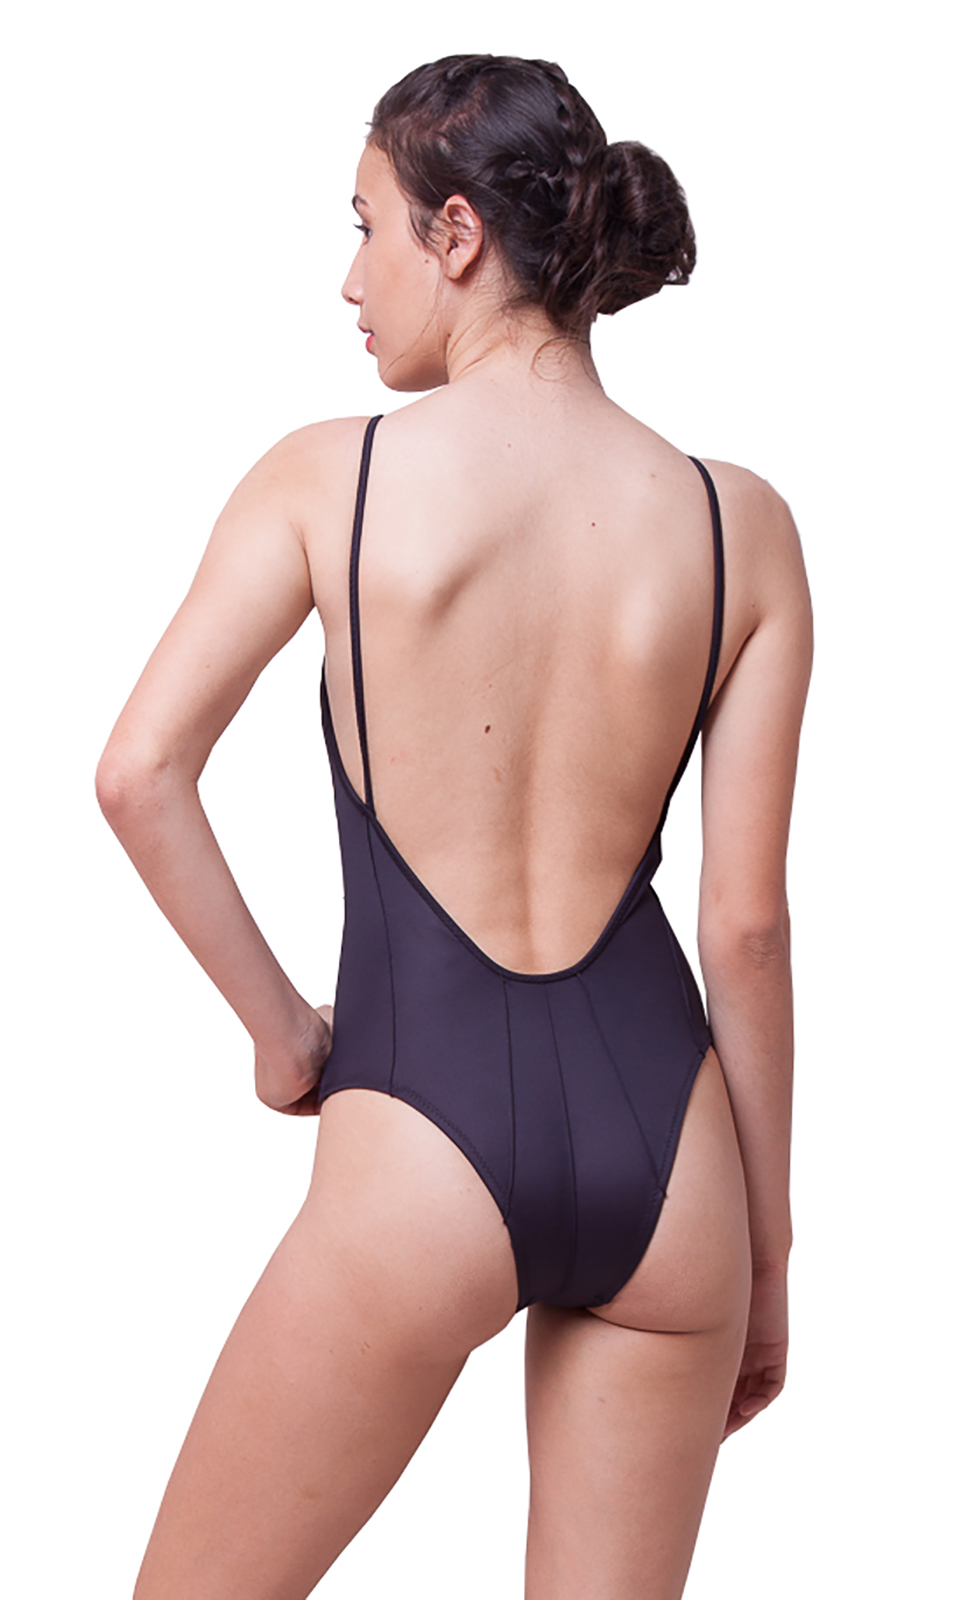 350b045006fe5 ... Luxurious black textured one-piece swimsuit - NEOPRENE TEXTURED BLACK